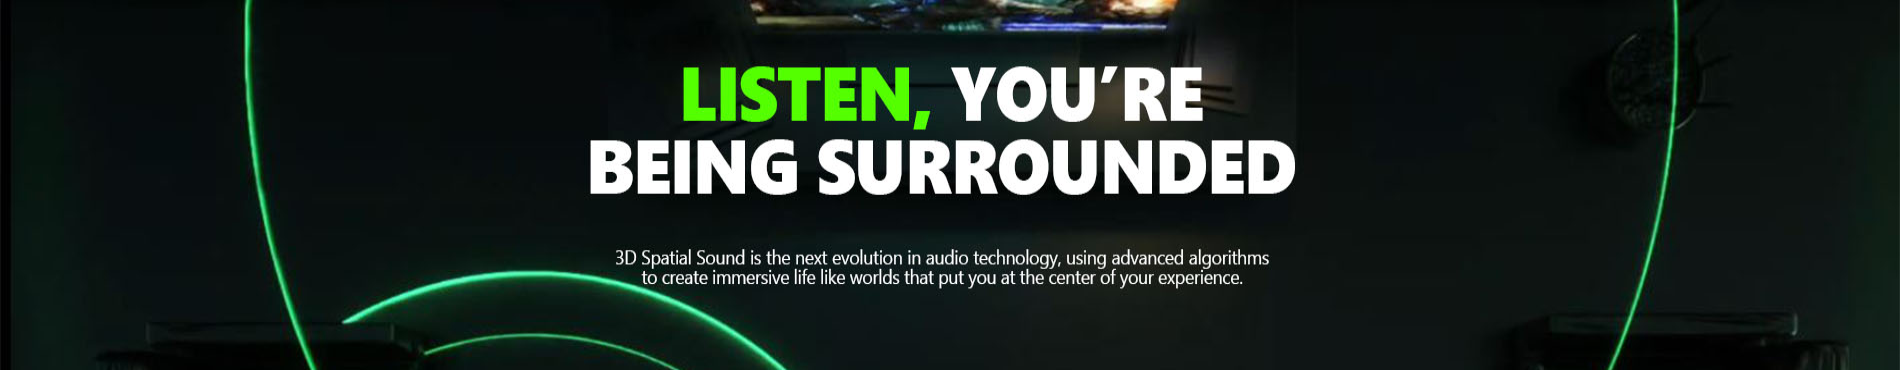 Microsoft Xbox Series X Informational Listen